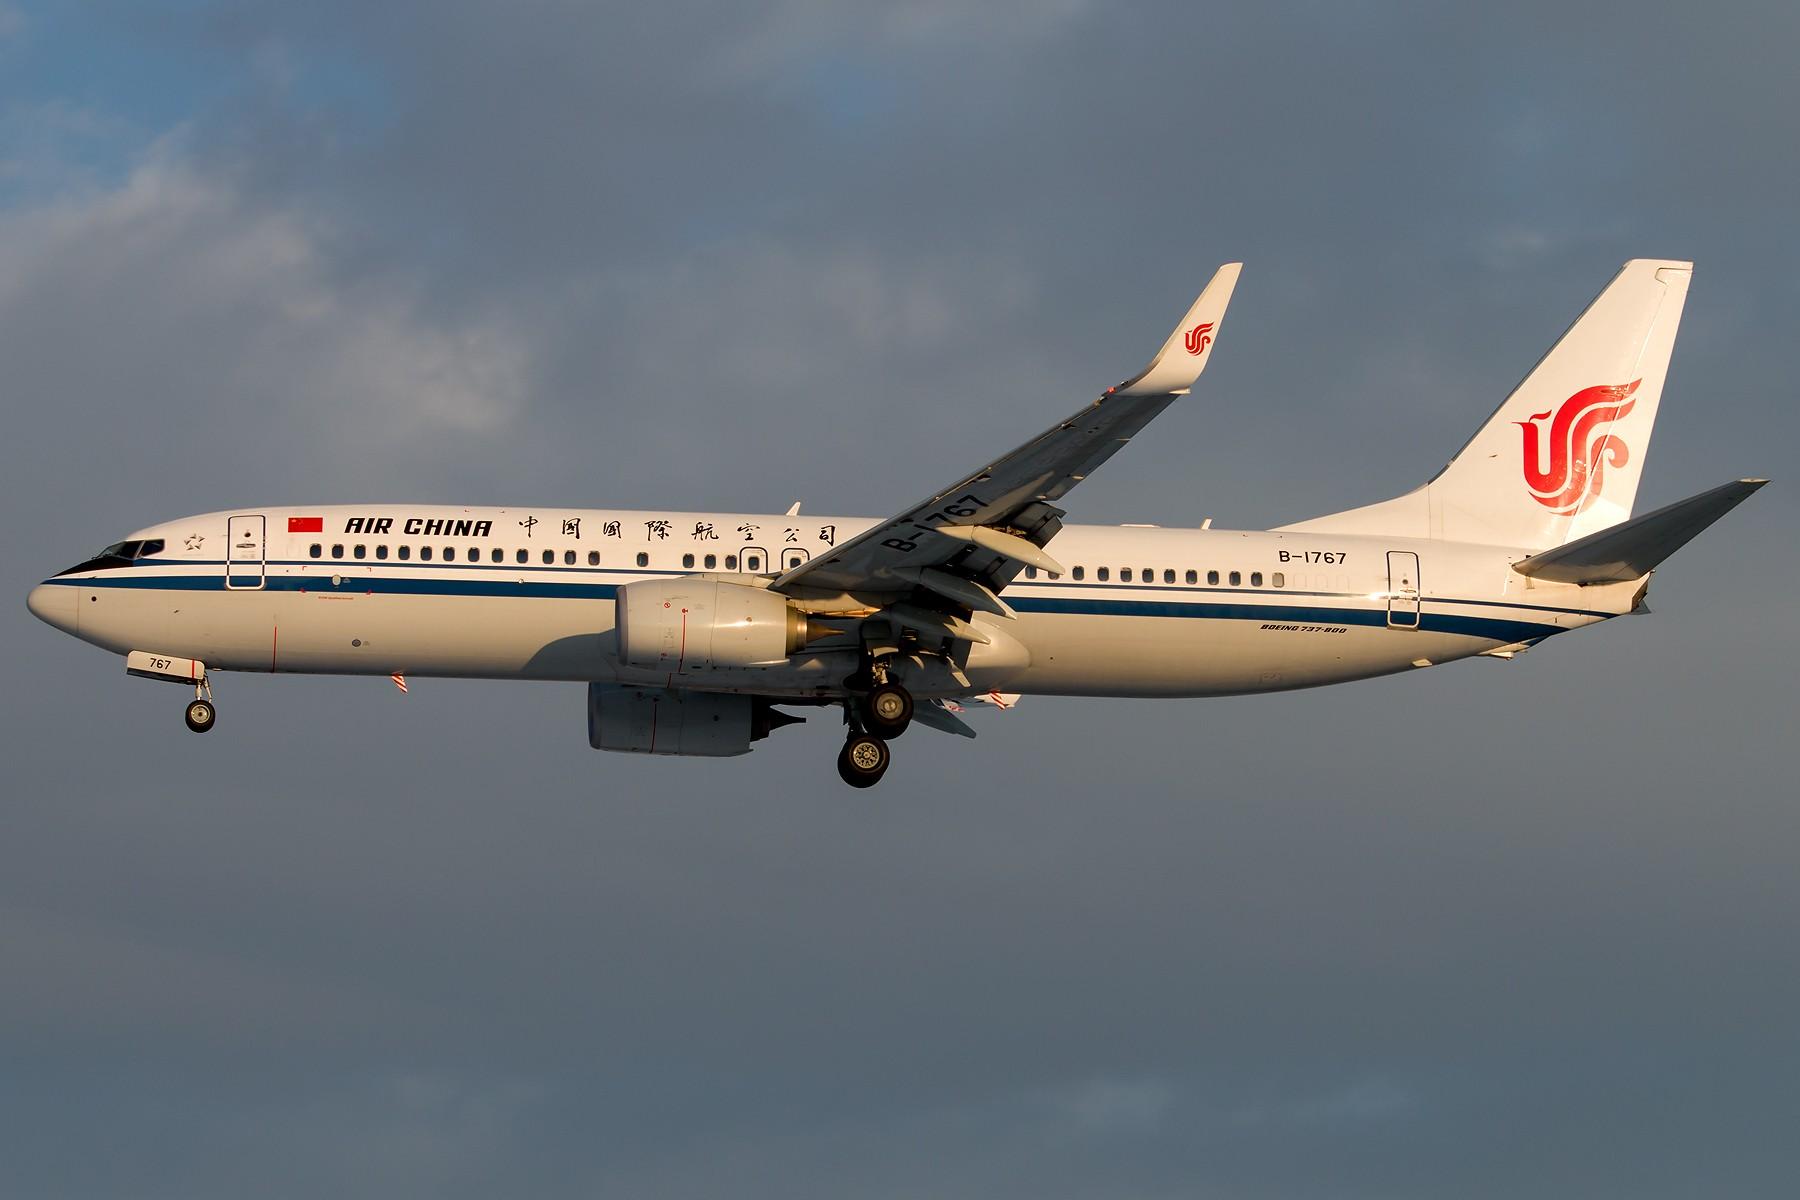 Re:[原创]标涂 1800*1200 [5pics] BOEING 737-800 B-1767 中国北京首都国际机场